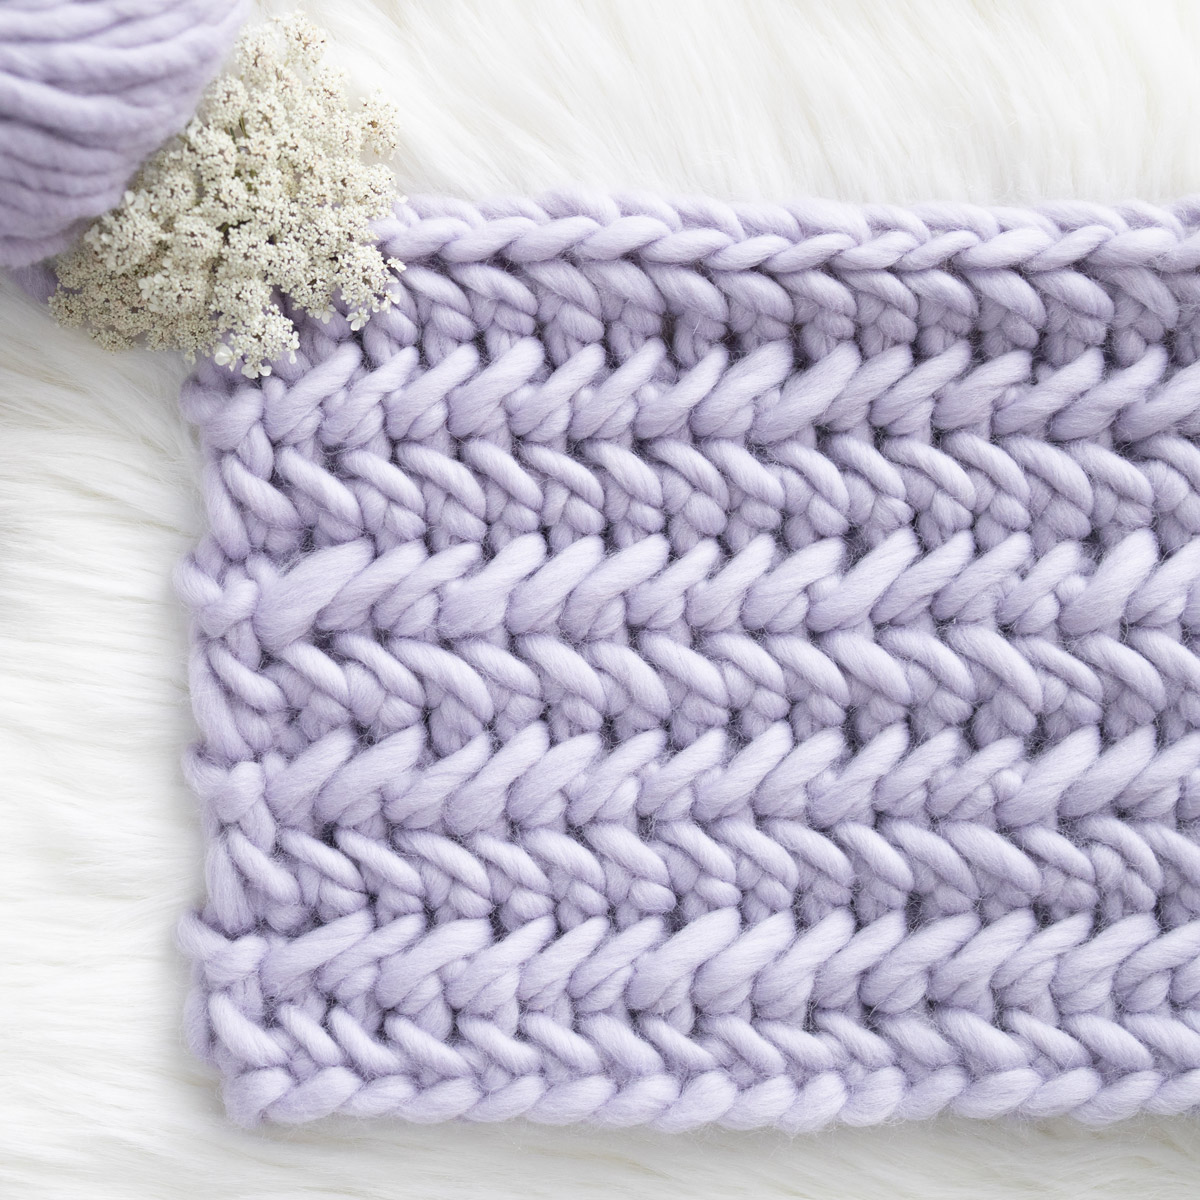 herringbone single crochet stitch tutorial super bulky yarn lilac